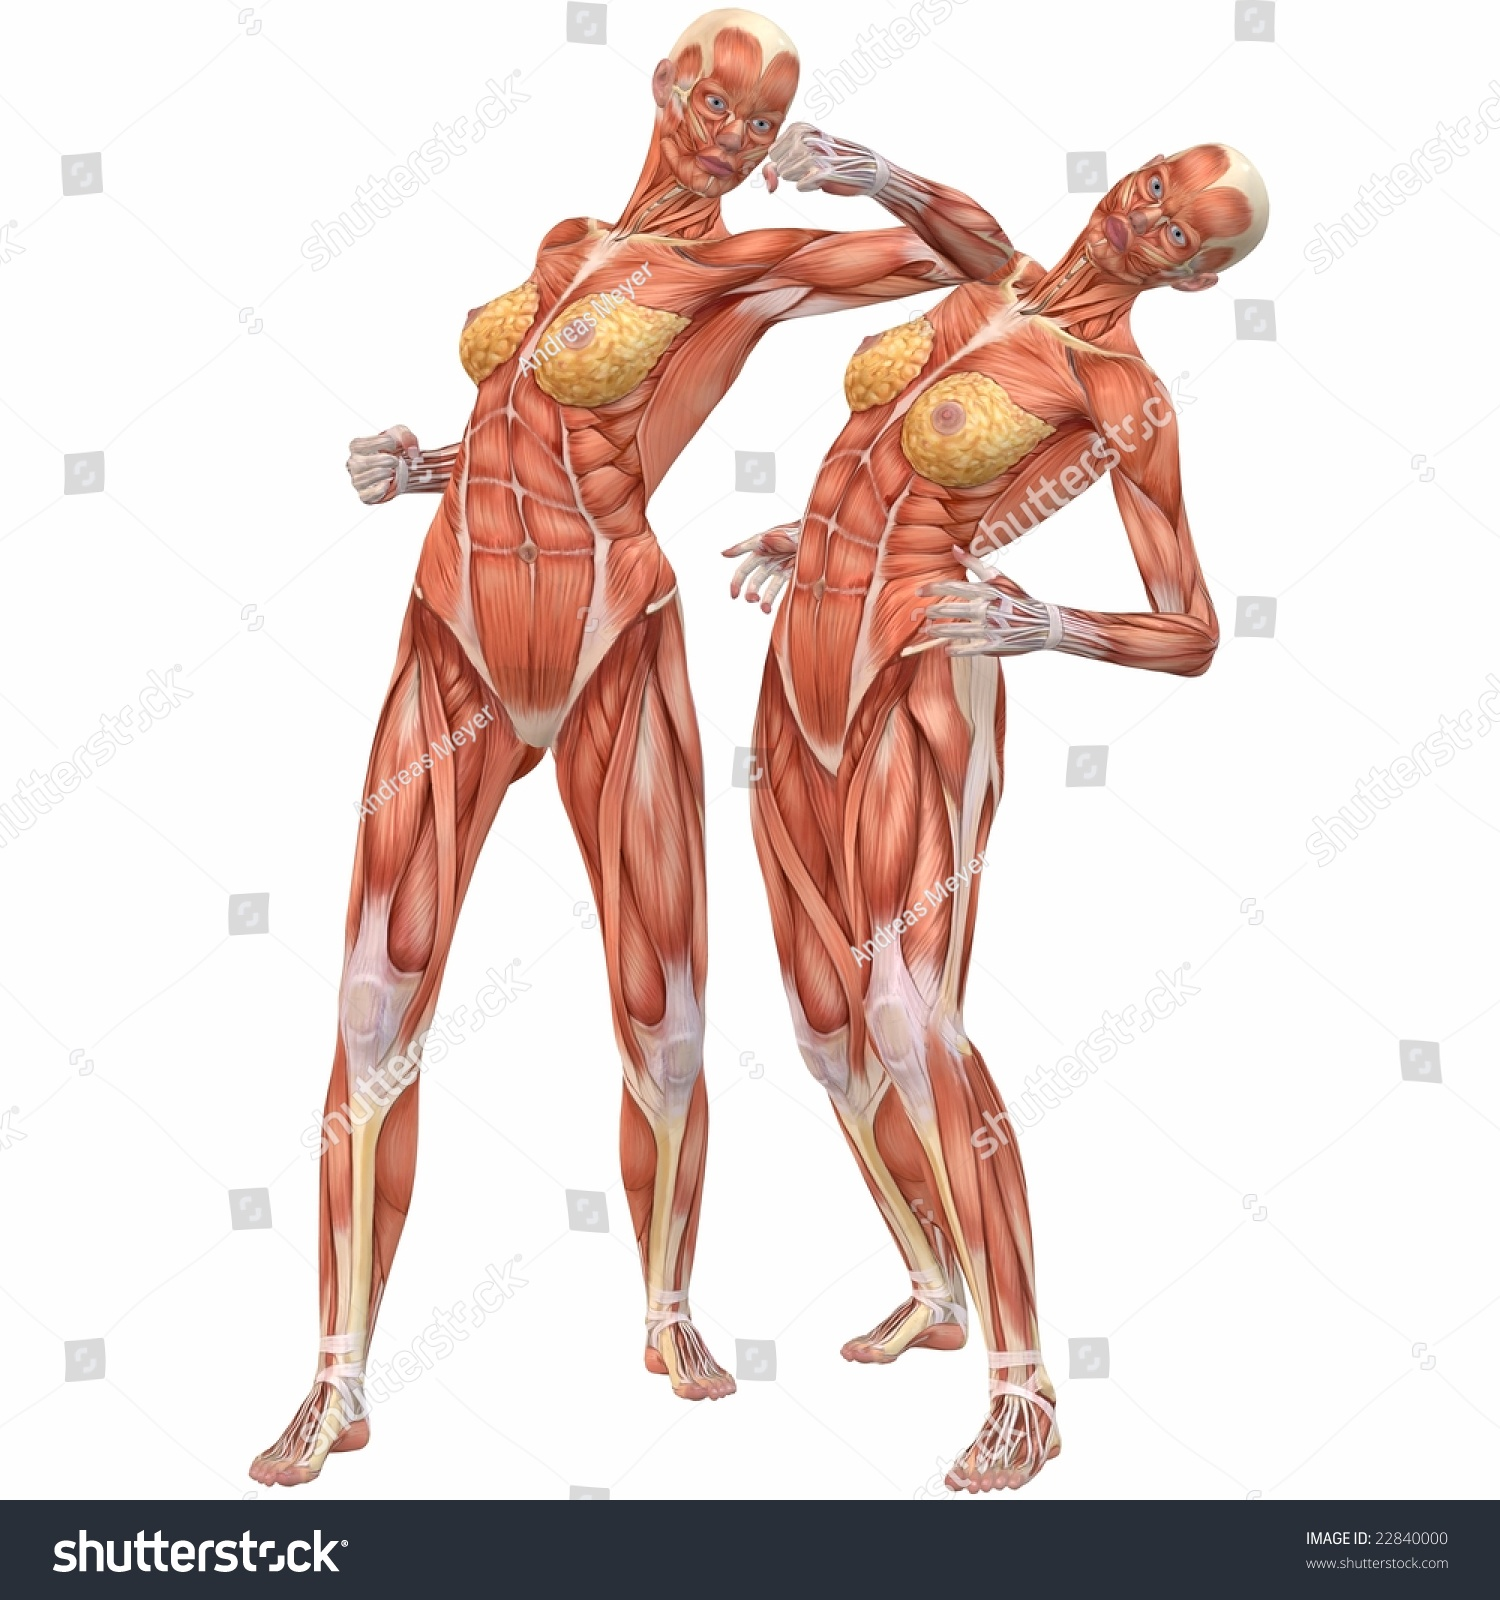 Female Human Body Anatomy Street Fight Stock Illustration 22840000